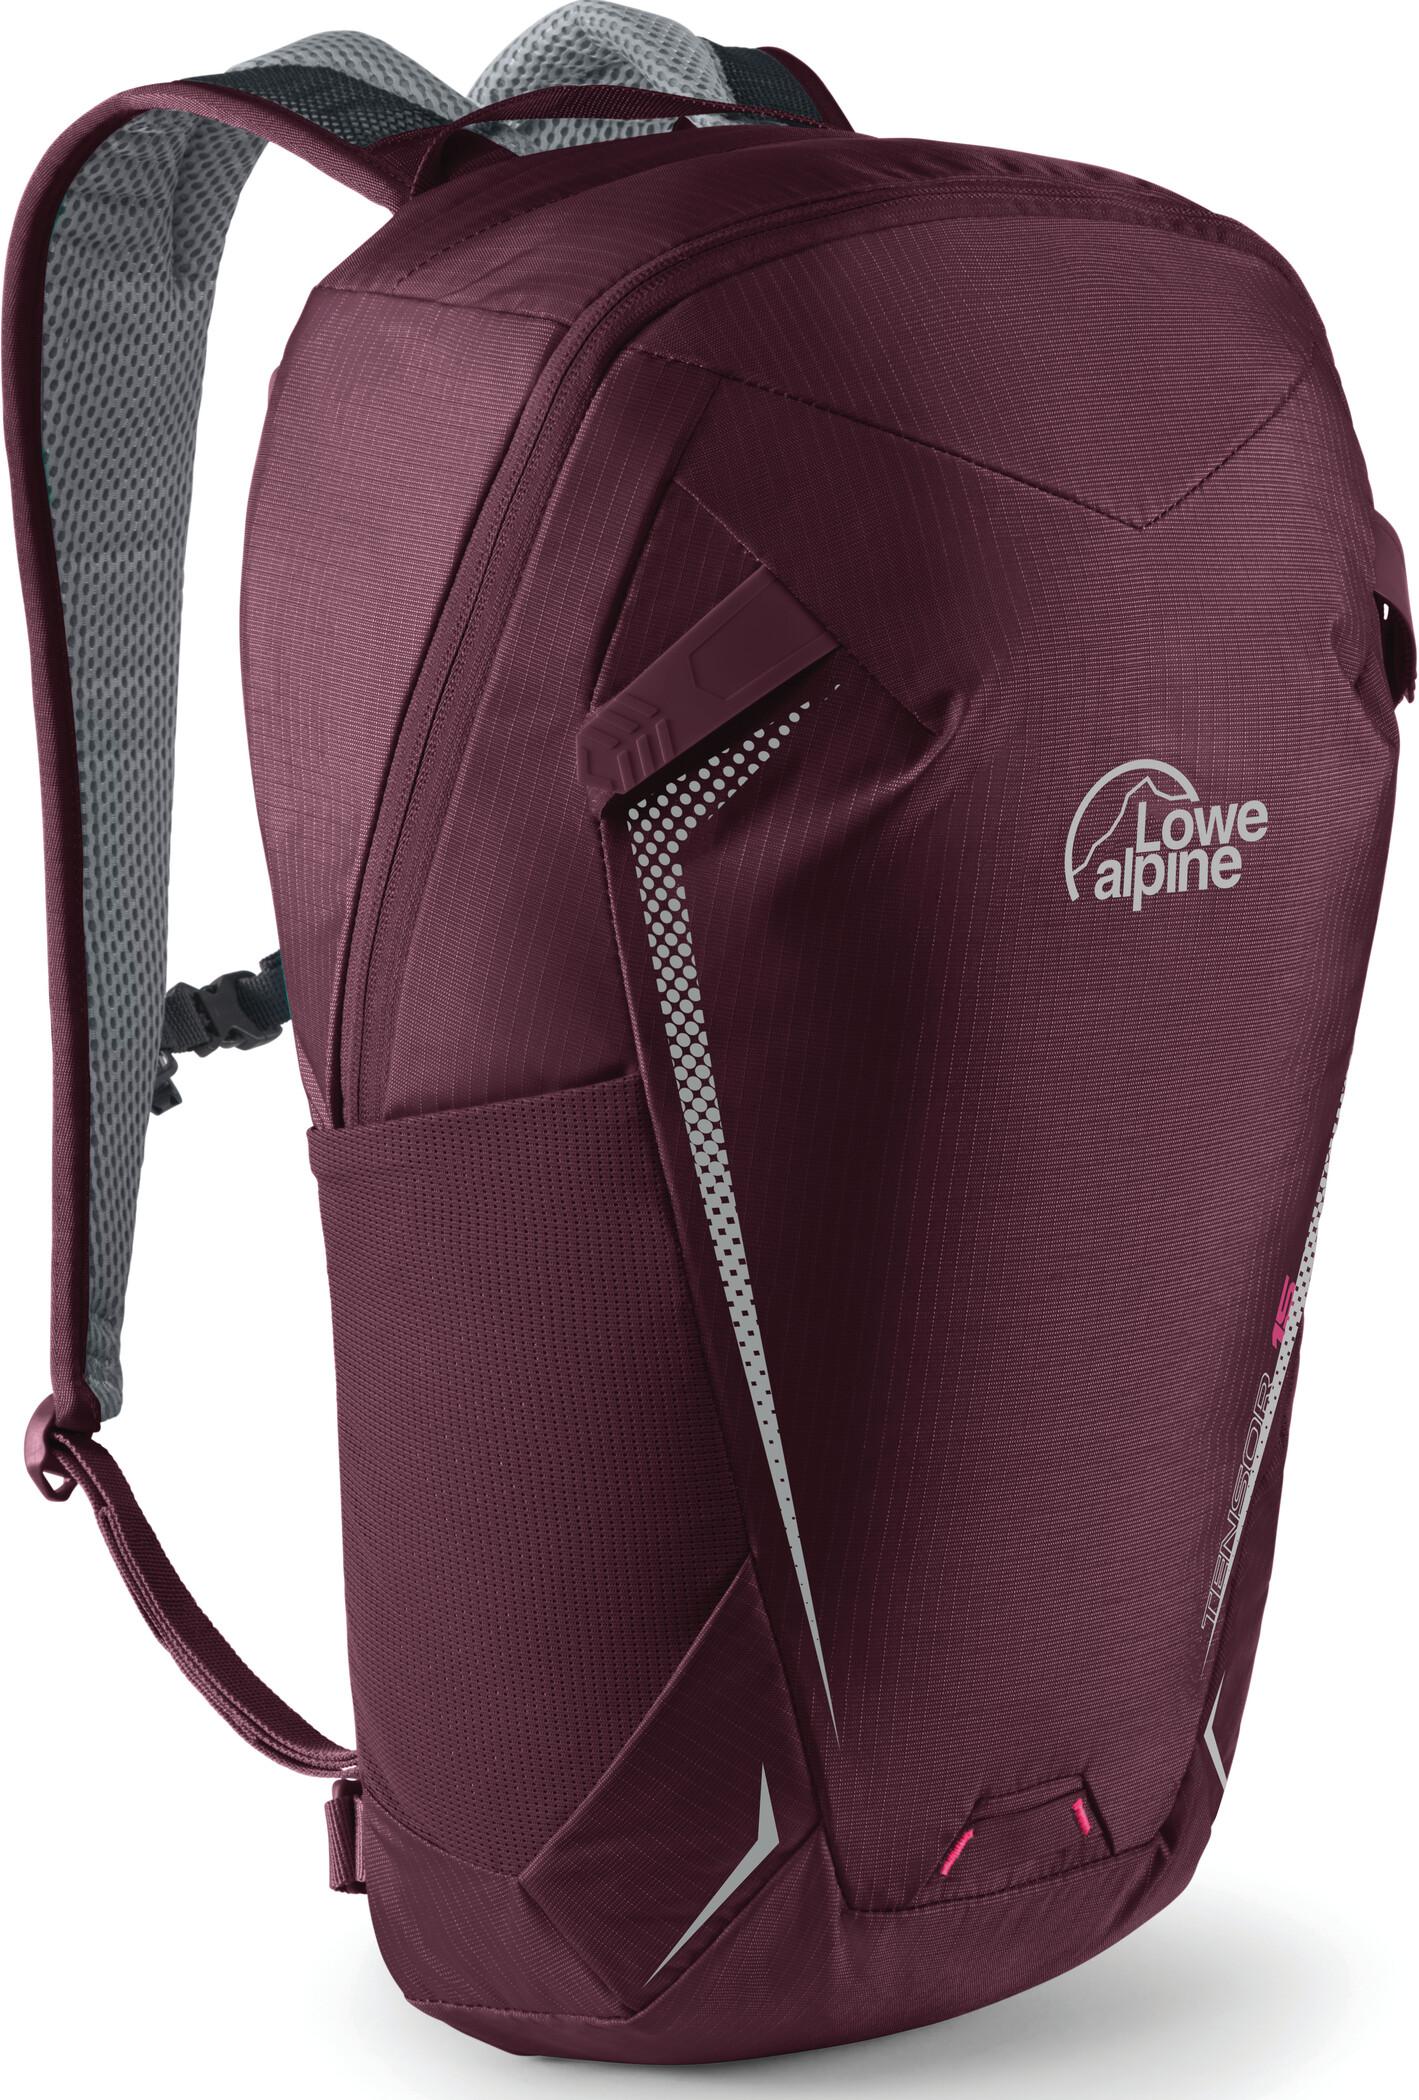 Lowe Alpine Tensor Backpack 16L, fig (2019)   Travel bags